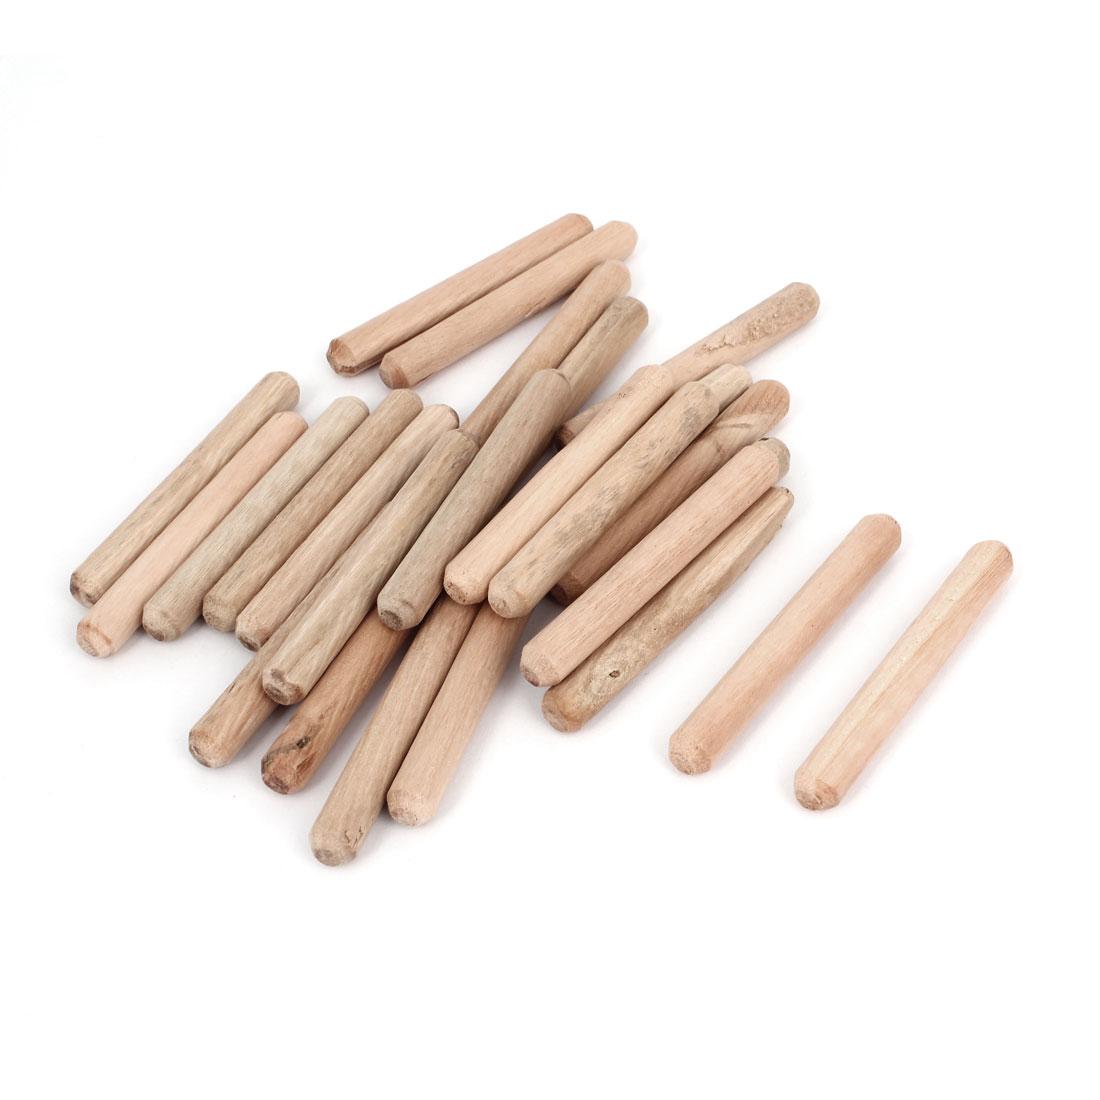 25 Pcs Furniture Cabinet Door Drawer Wooden Dowels Pins 60mm x 8mm